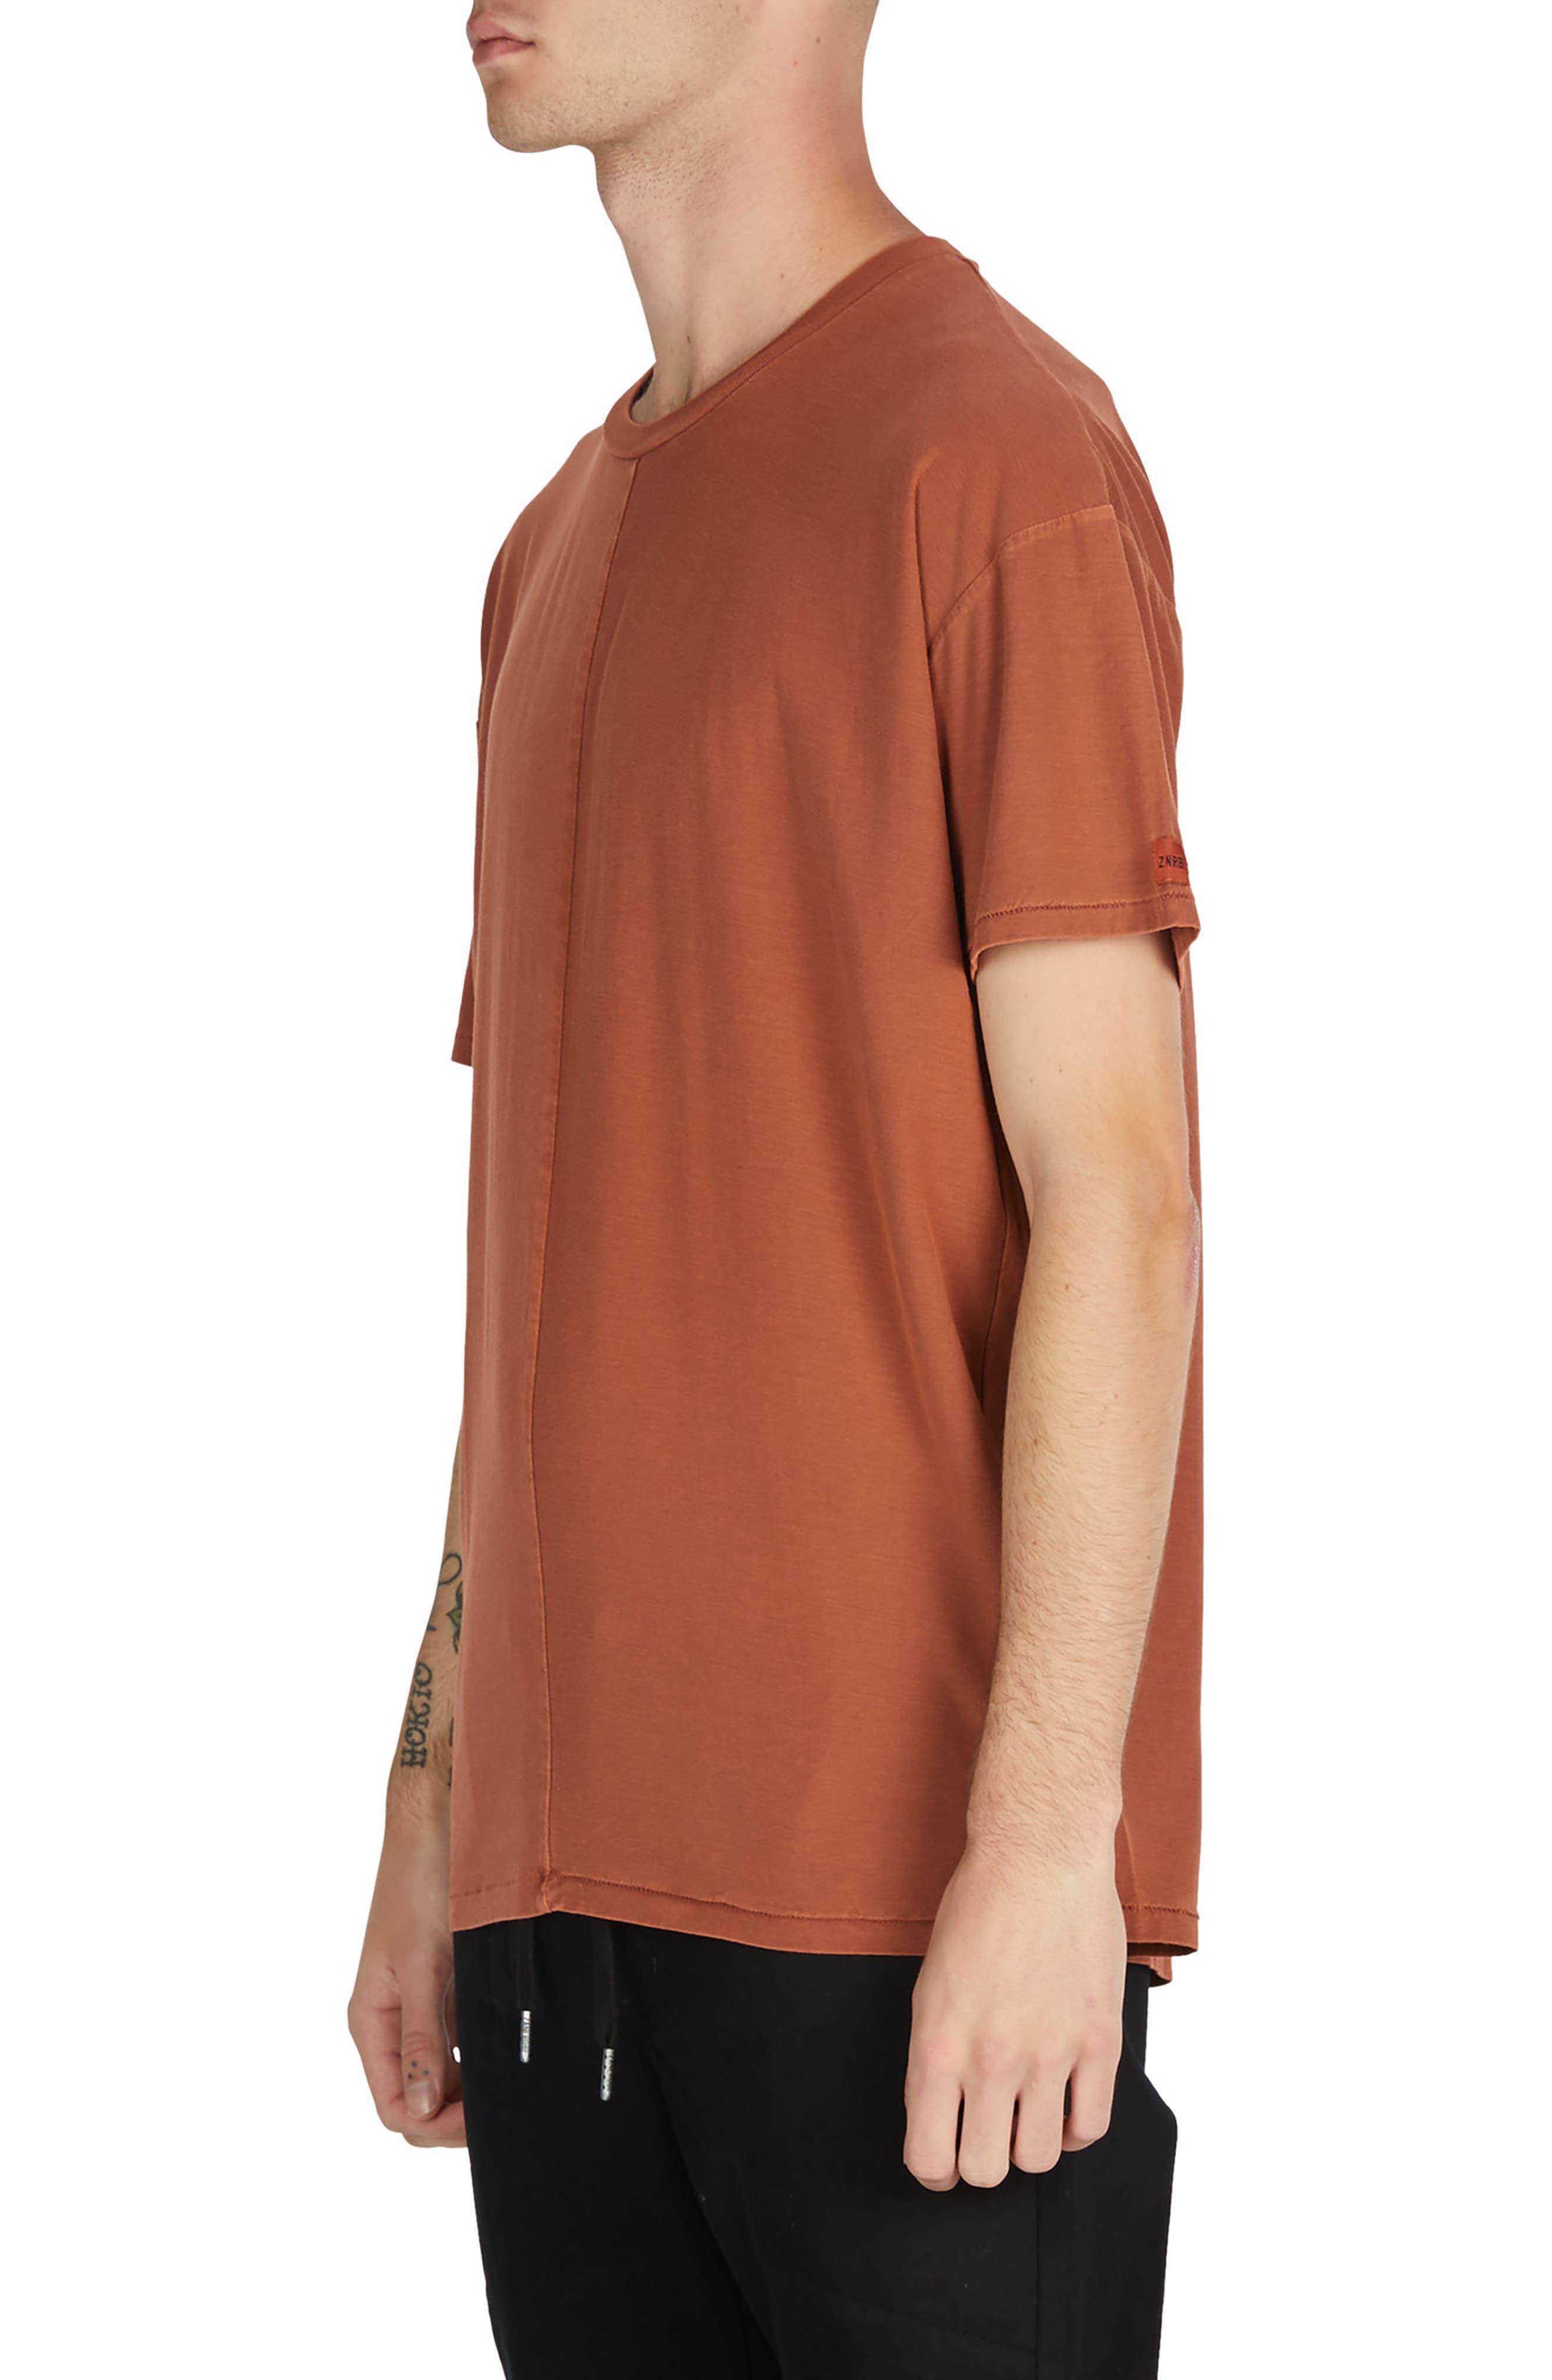 Rugger T-Shirt,                             Alternate thumbnail 4, color,                             800